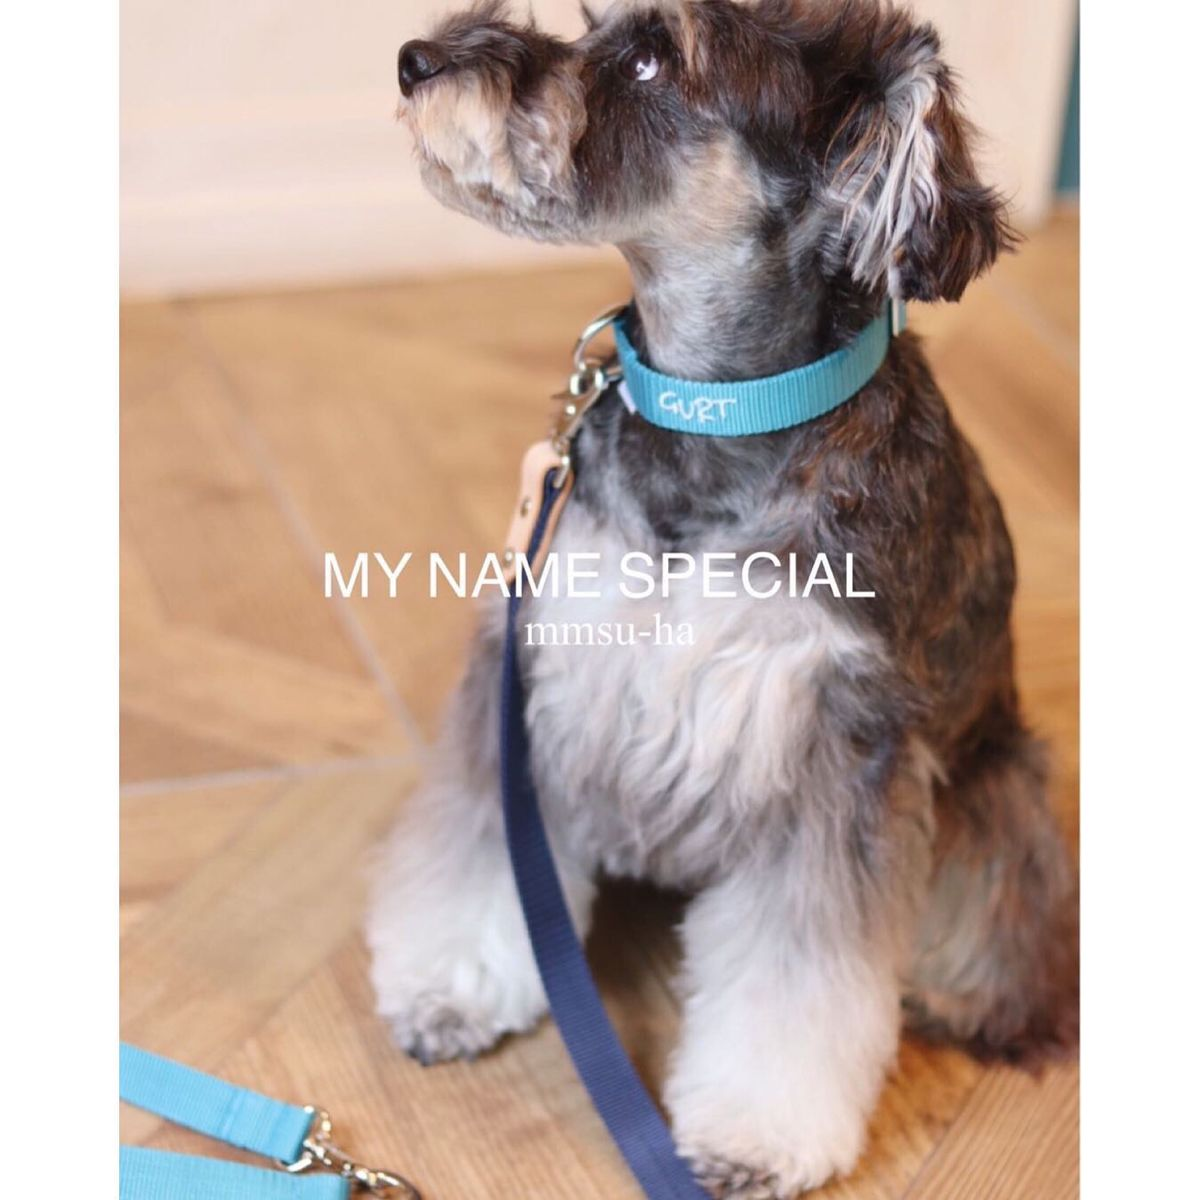 Mmsu Haが贈る首輪 My Name 犬 シュナウザー 革 犬 シュナウザー 首輪 犬